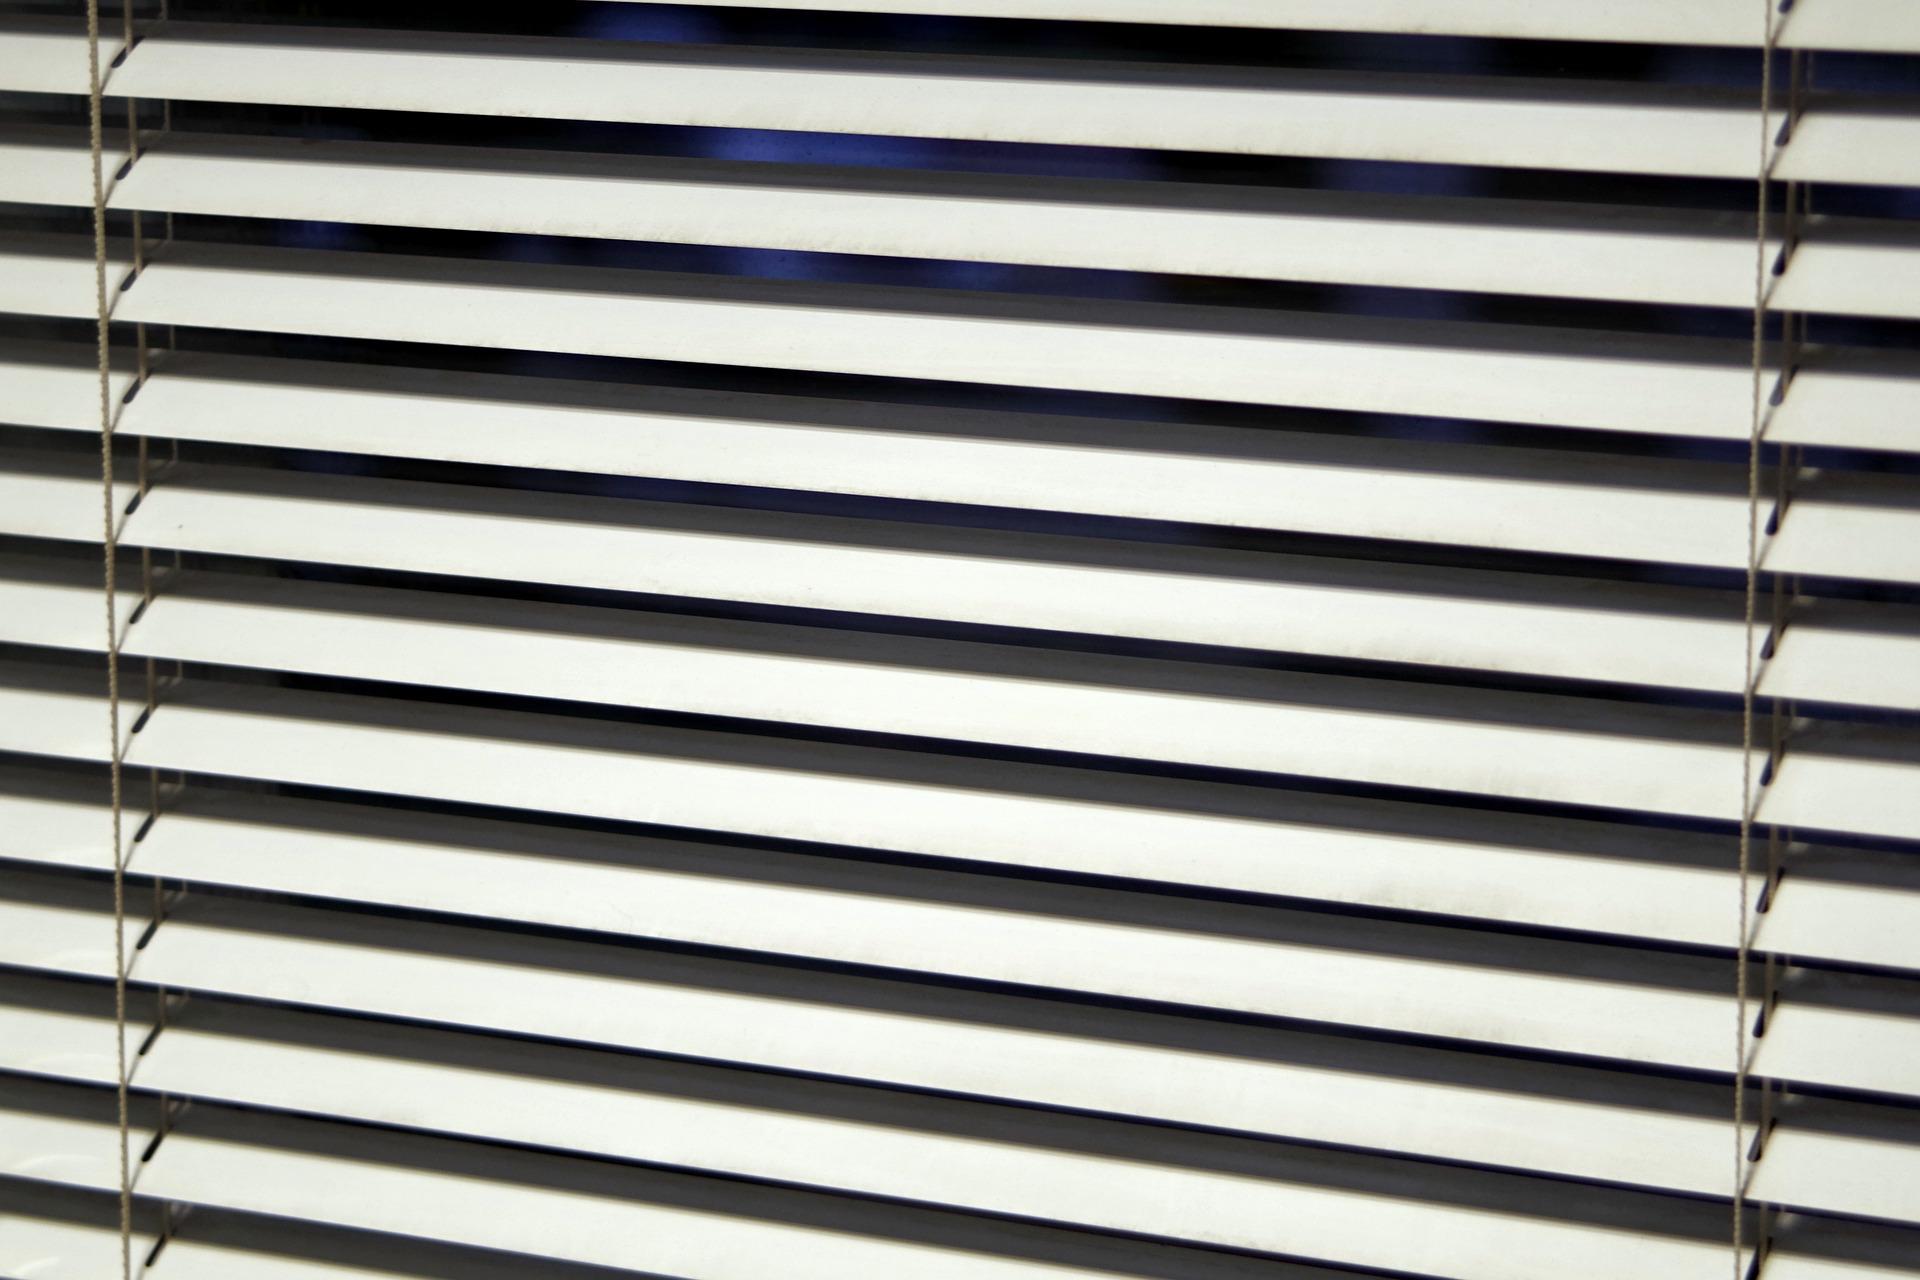 blinds-1732186_1920